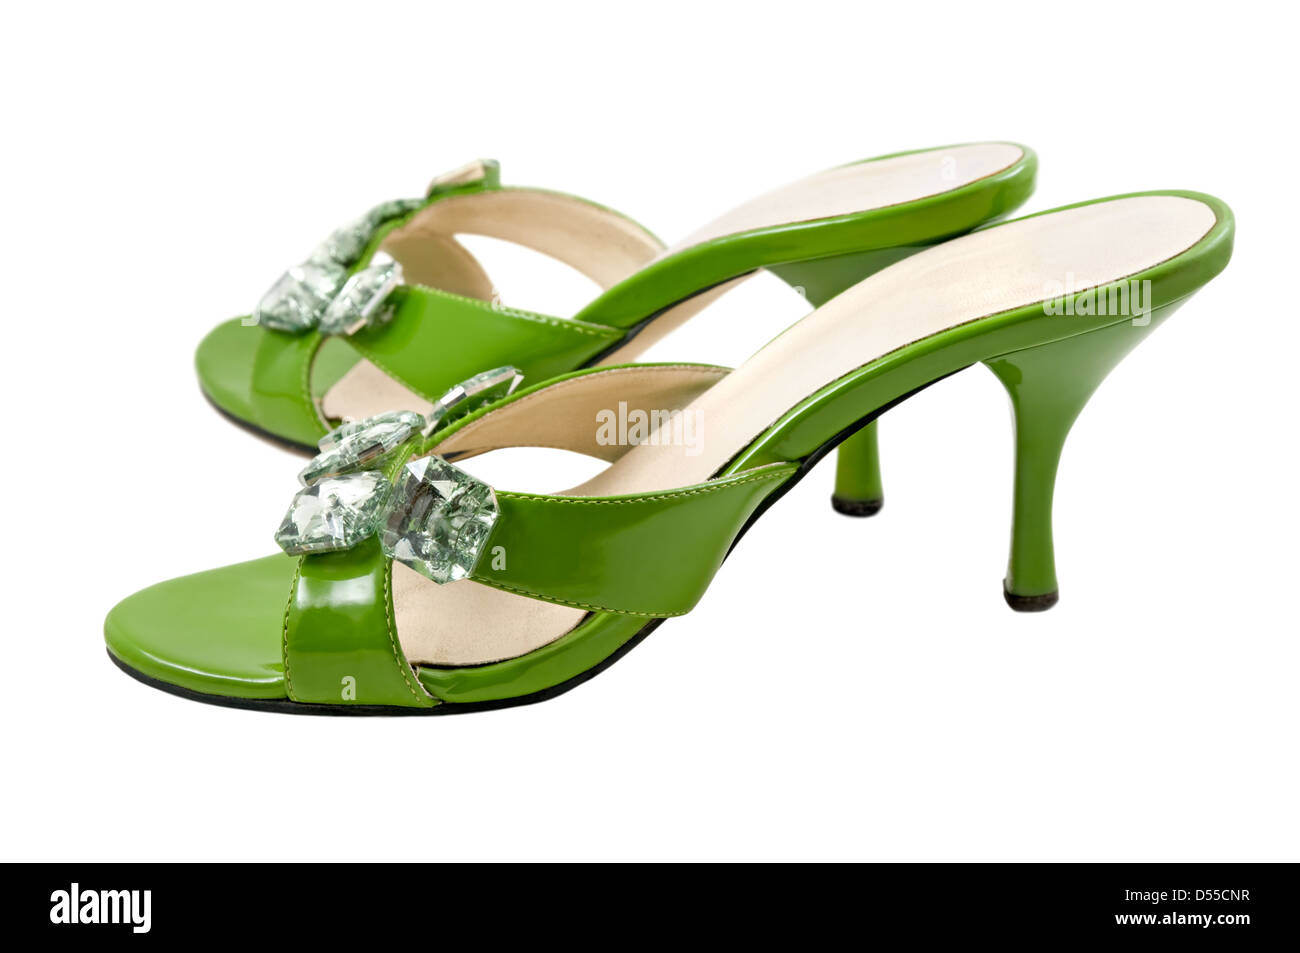 Green High Heel Shoes Immagini   Green High Heel Shoes Fotos Stock ... b824facfb77